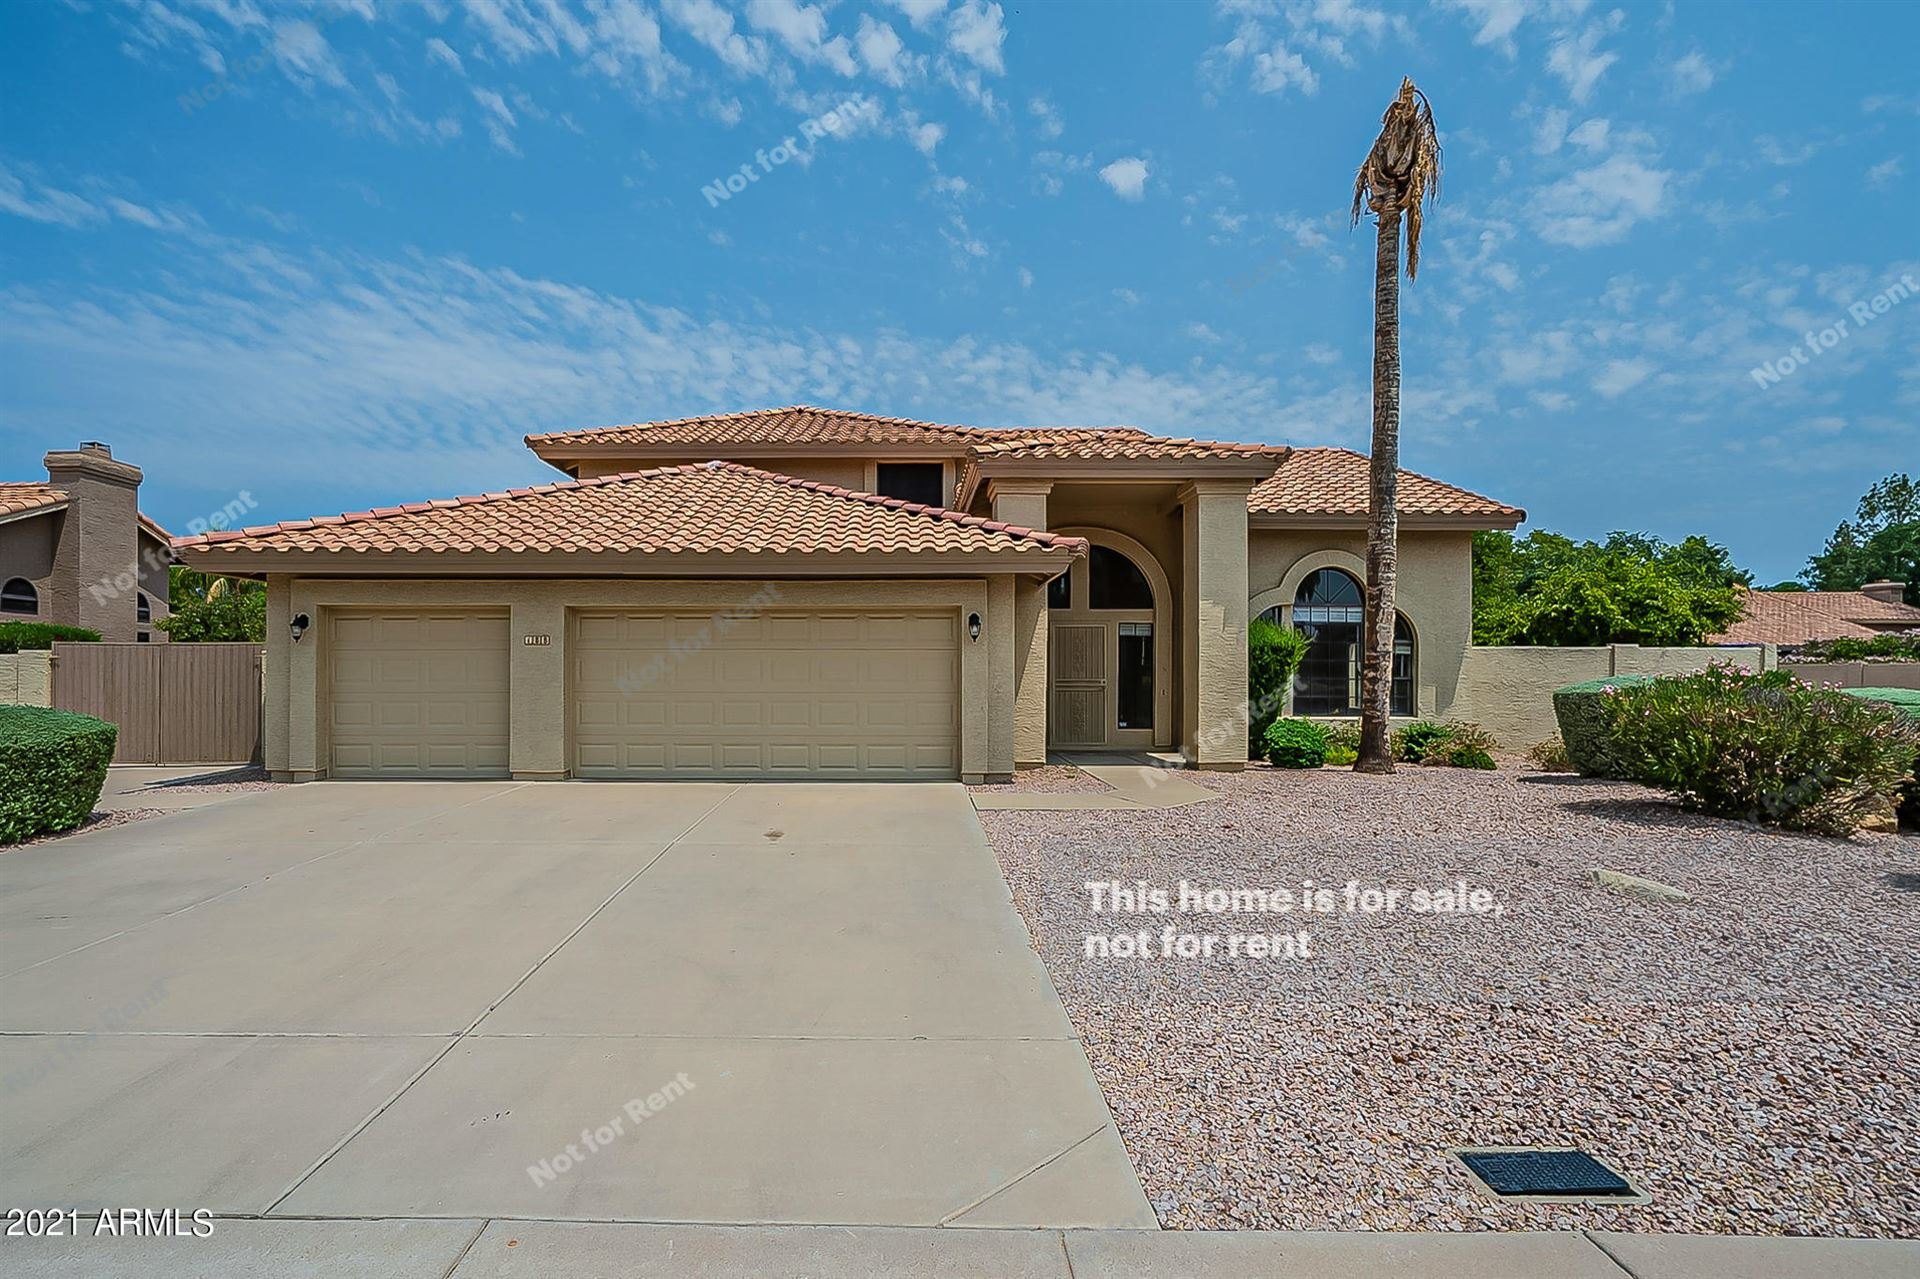 Photo of 188 E DAWN Drive, Tempe, AZ 85284 (MLS # 6268789)